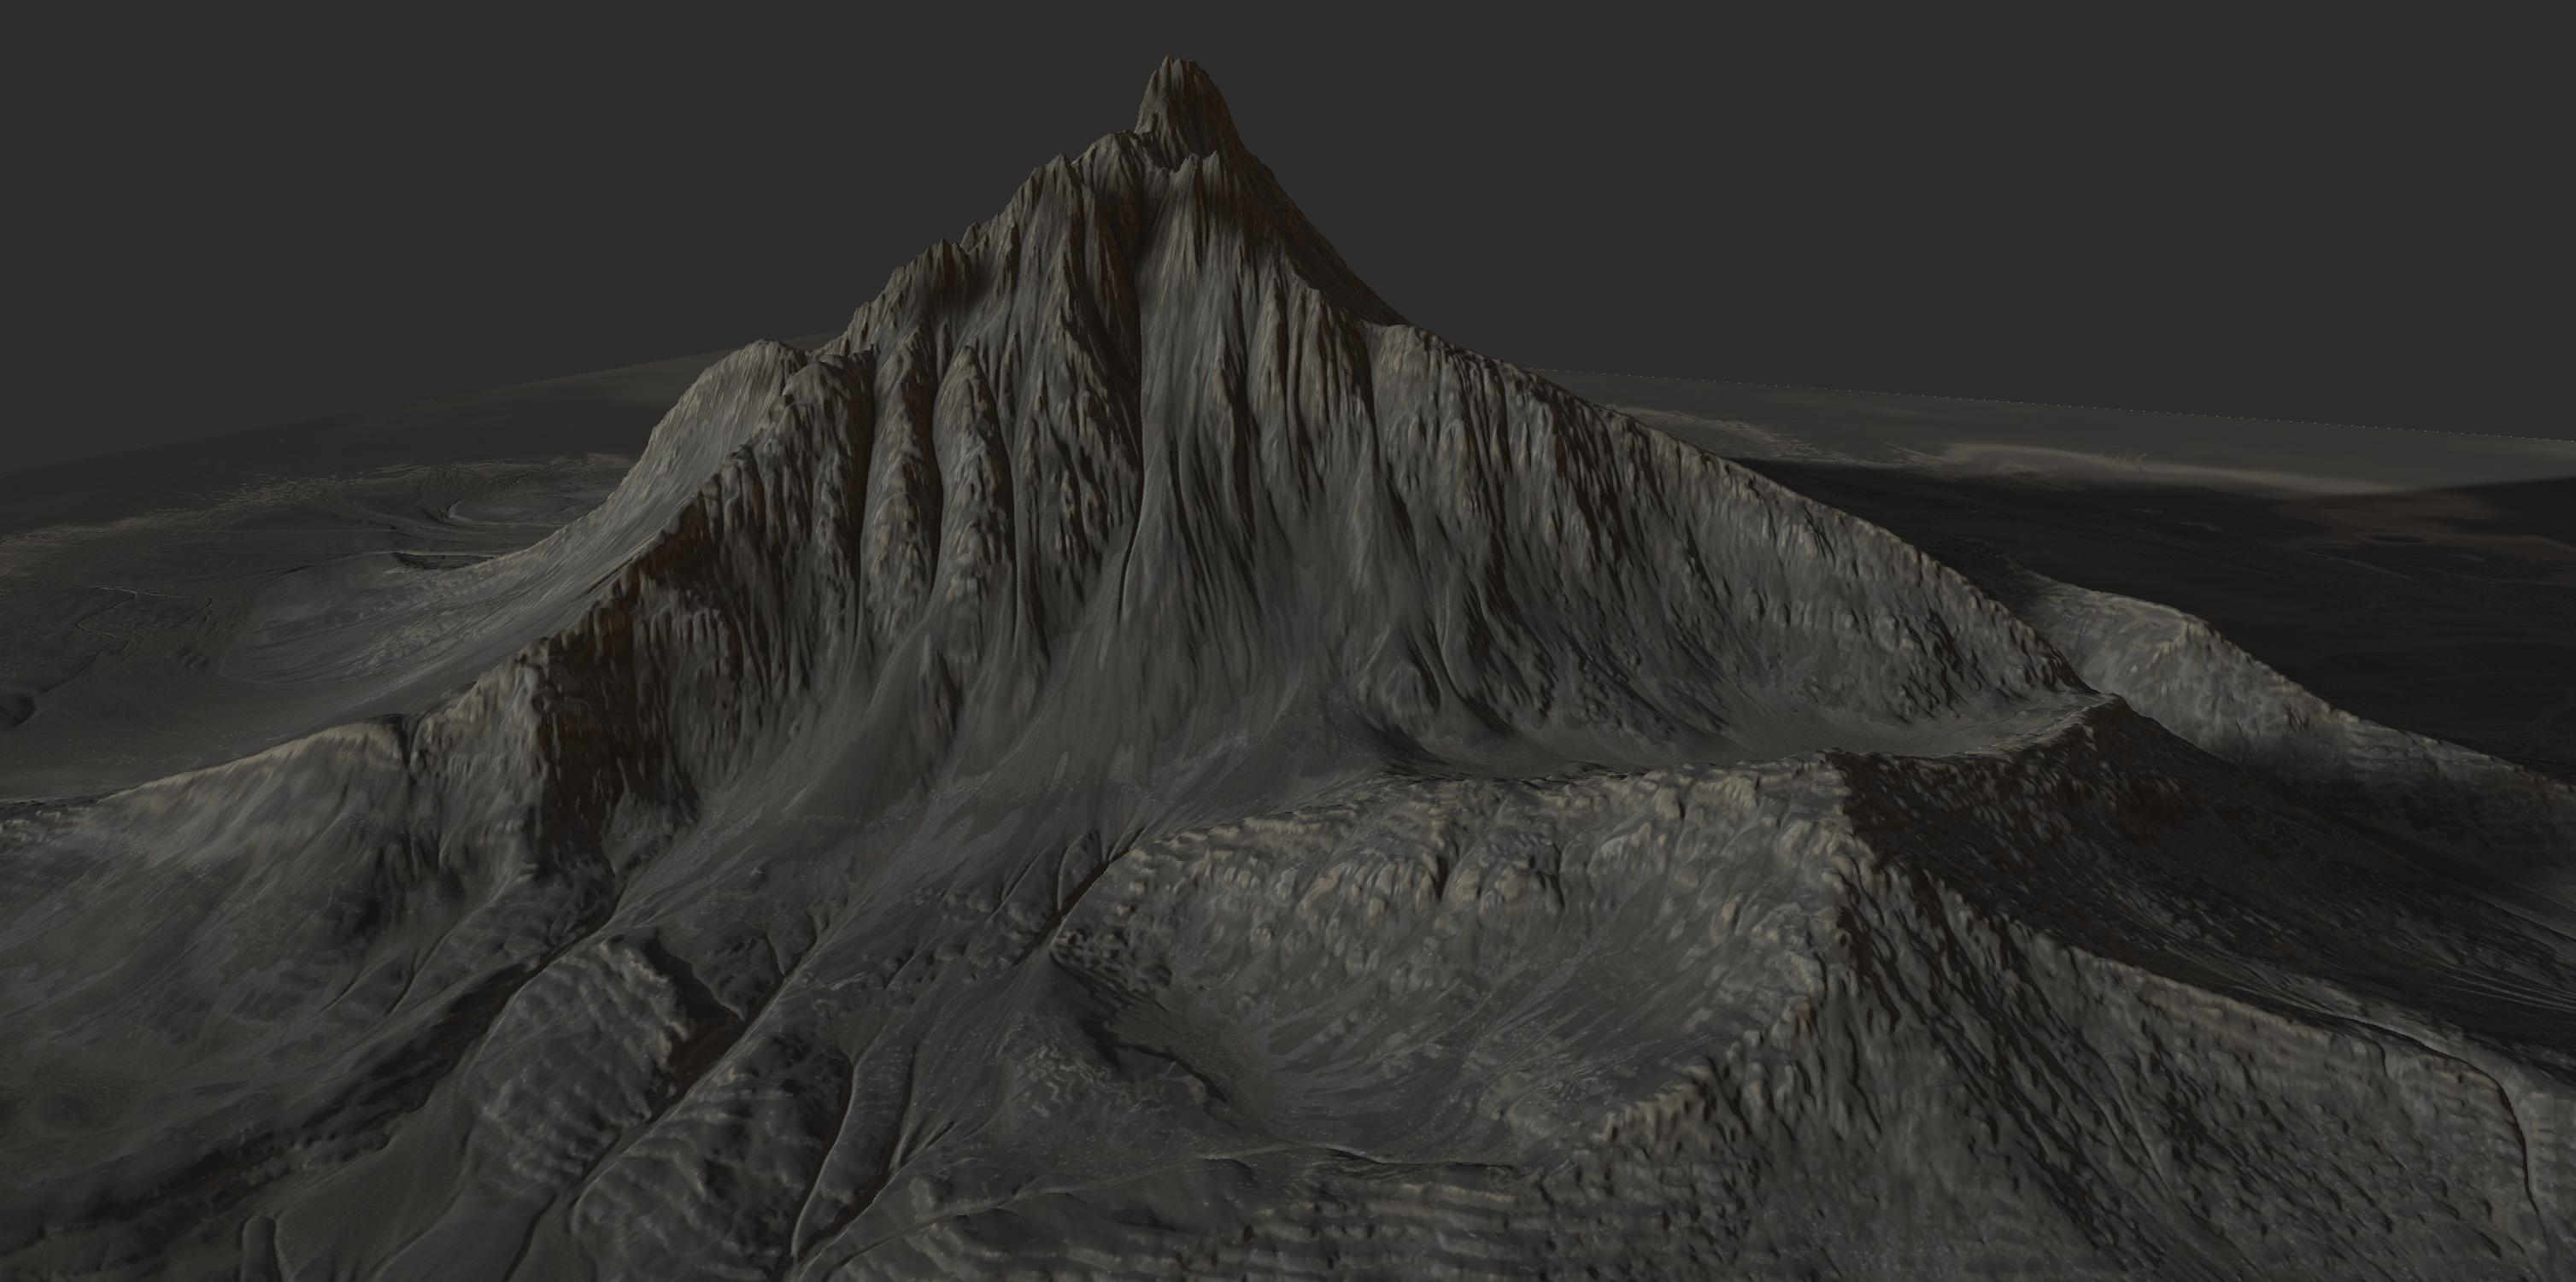 Gaea mountain-rocks